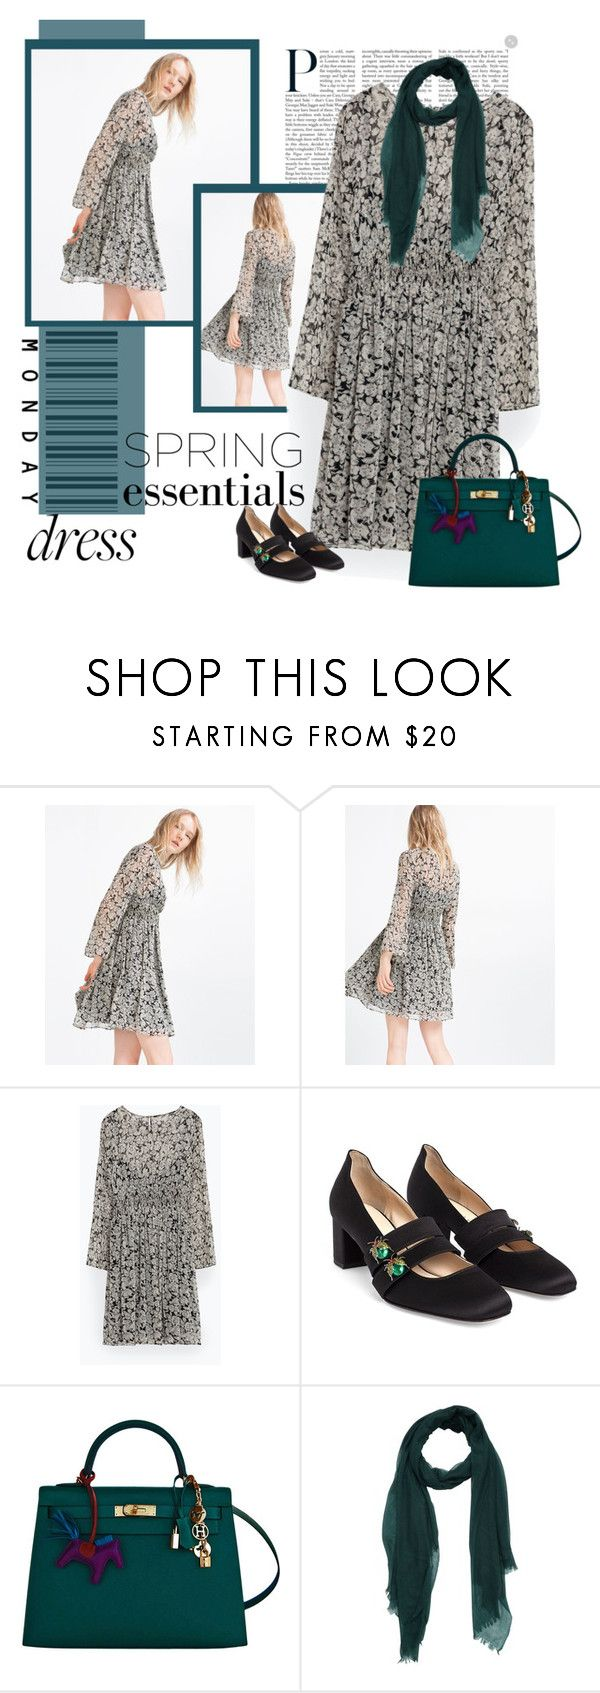 """monday dress"" by bodangela ❤ liked on Polyvore featuring Zara and Hermès"